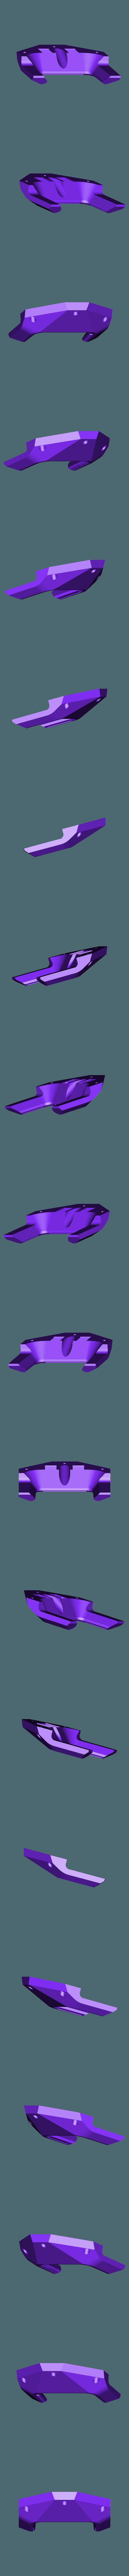 Dual_E3D_Mount_v4-4_DUCT.STL Download free STL file Jellyfish Mount (RigidBot Dual E3Dv6) • 3D printer object, WalterHsiao